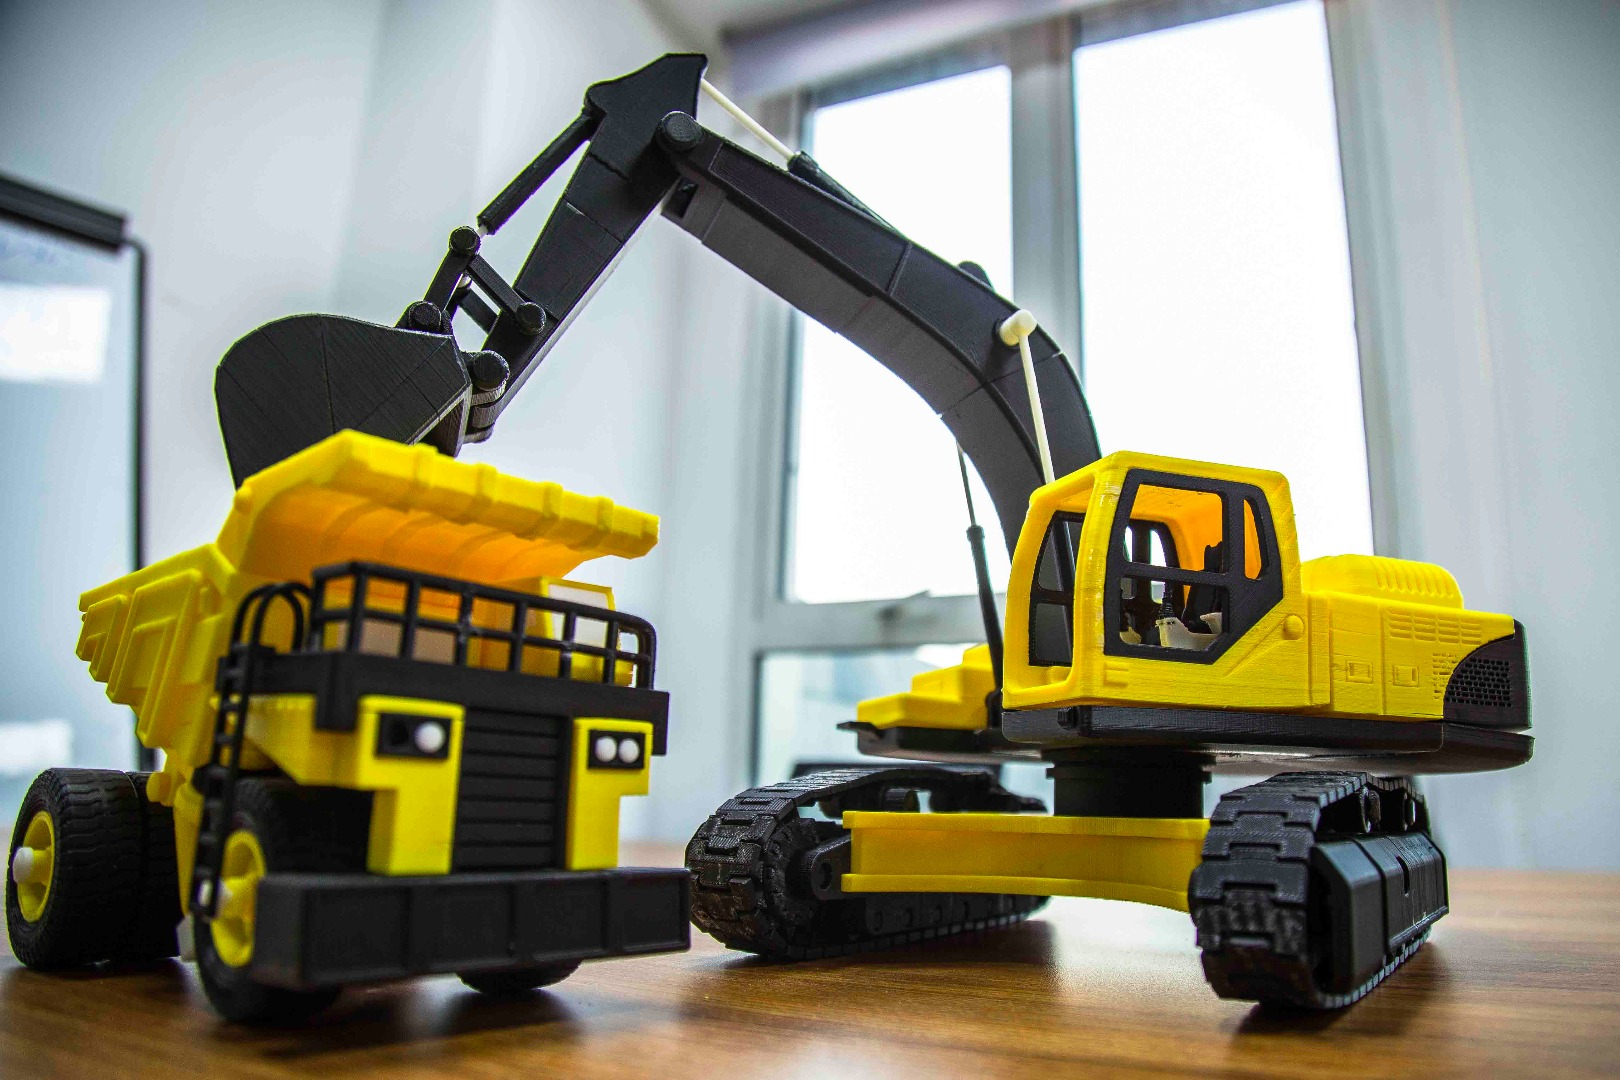 Picture of Toy Excavator